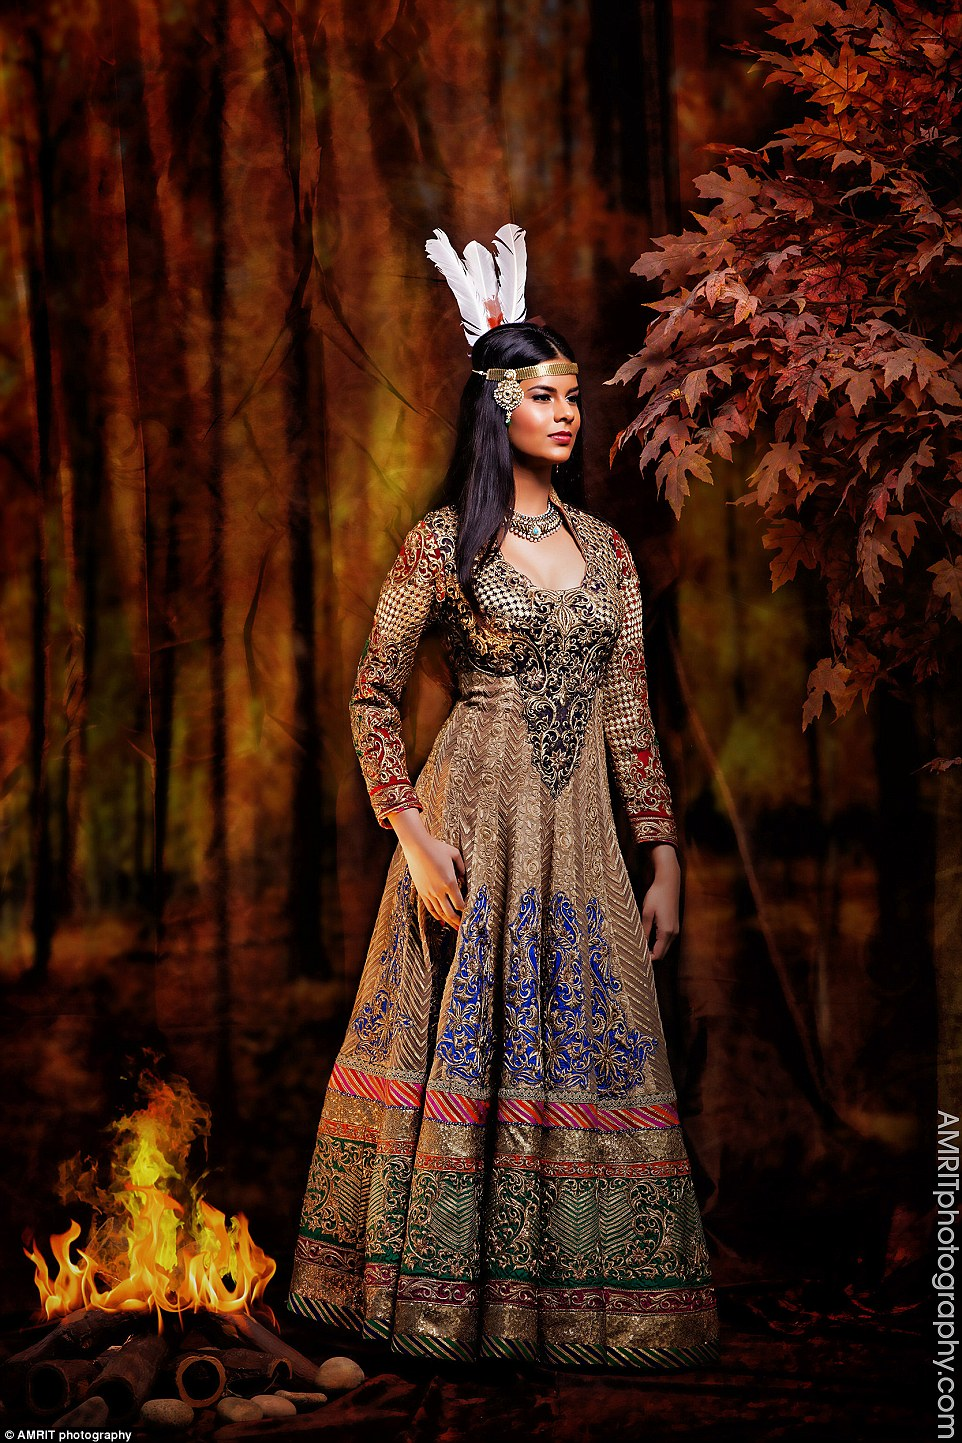 princesse disney indienne pocahontas